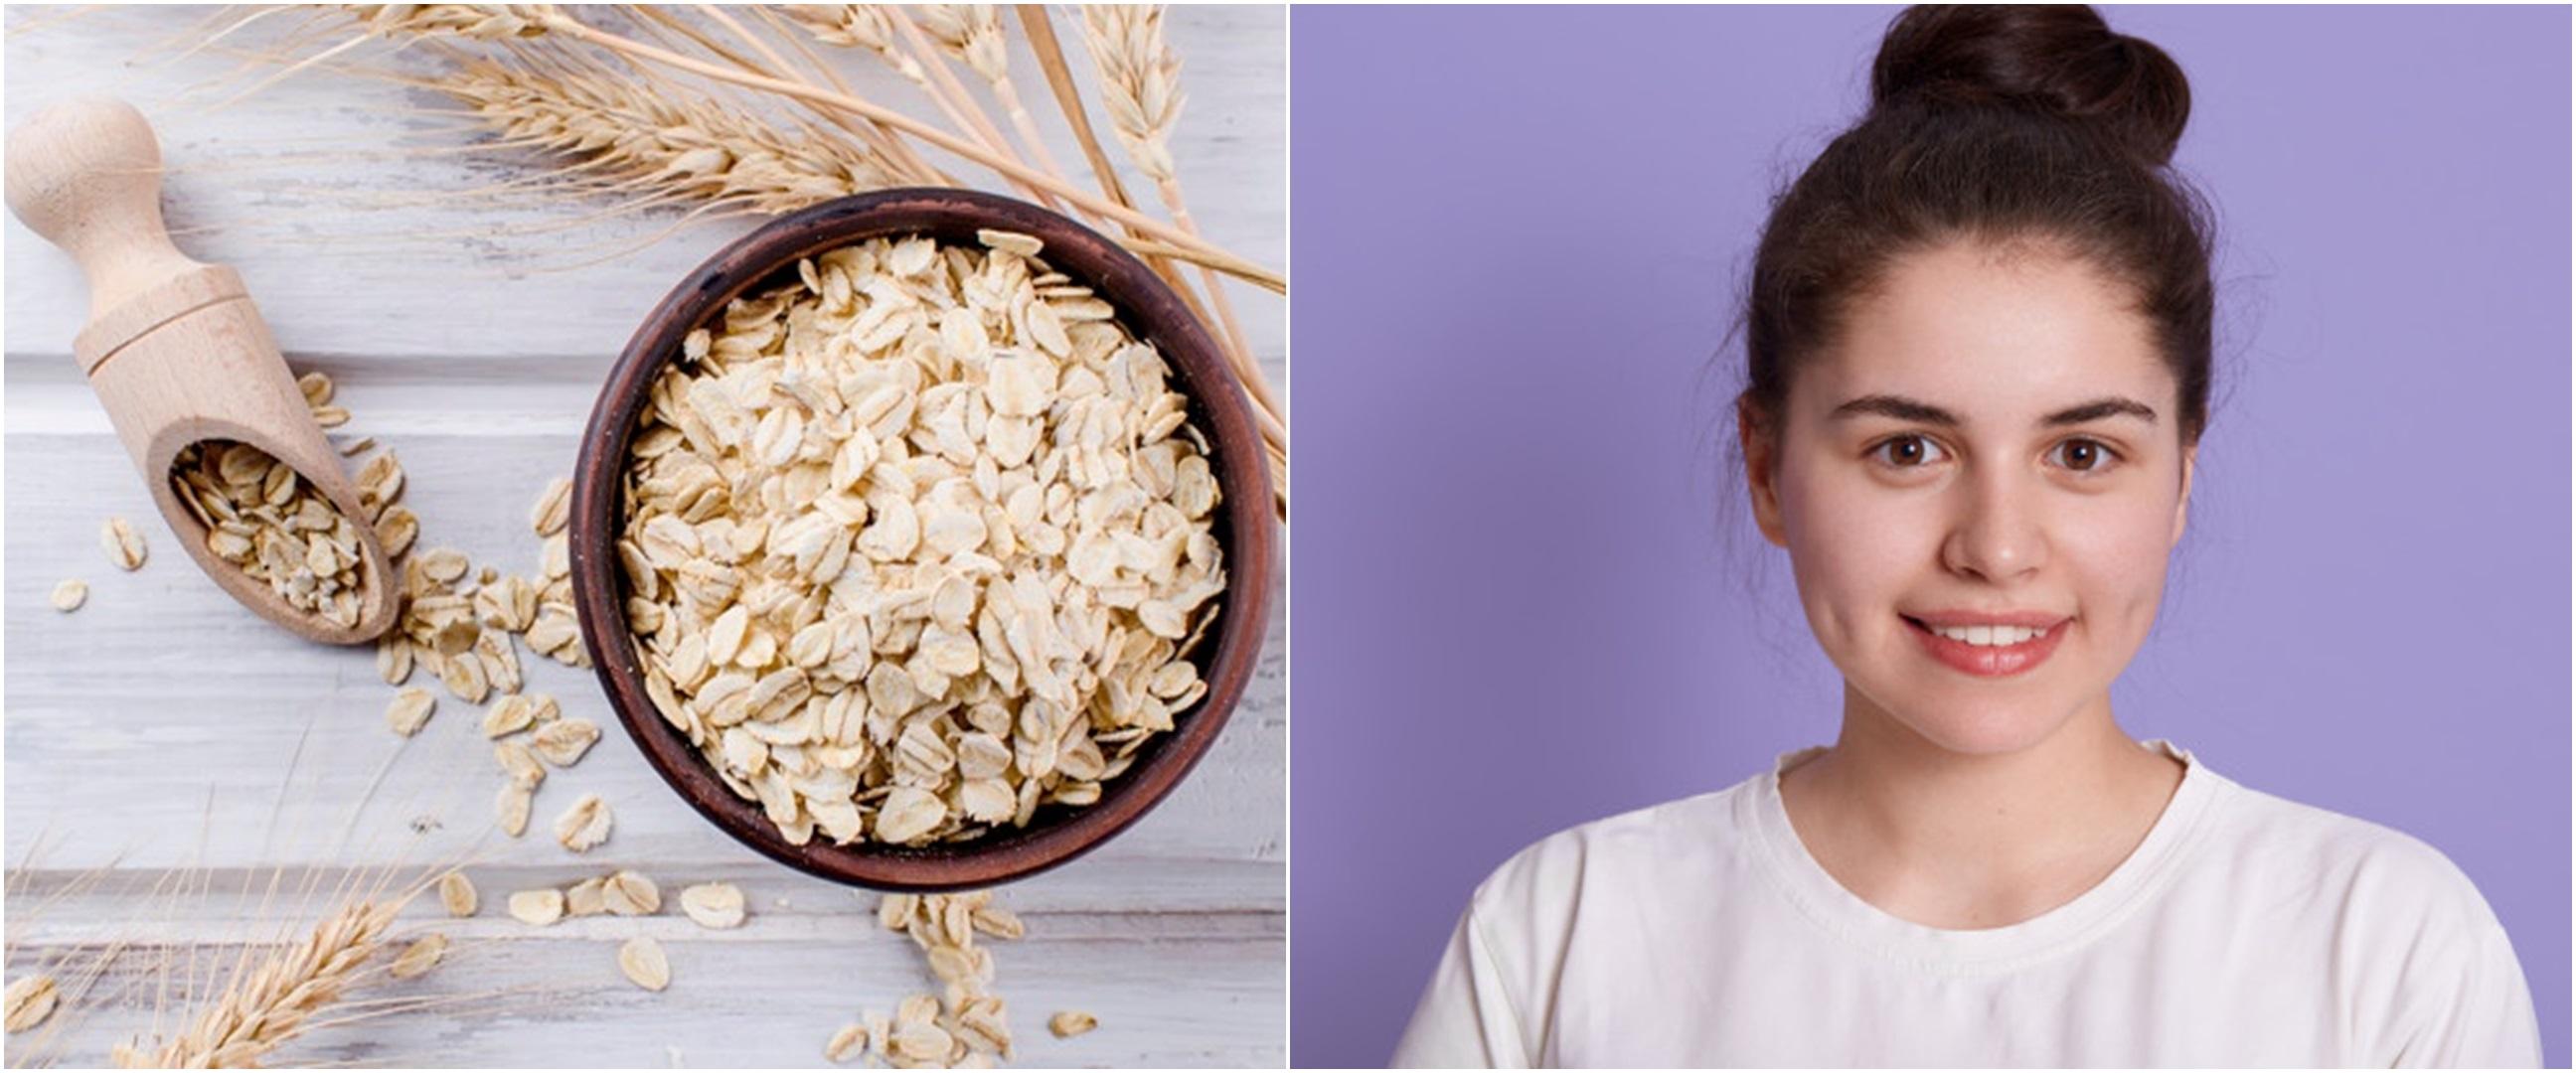 8 Manfaat oatmeal untuk kecantikan beserta cara pakainya